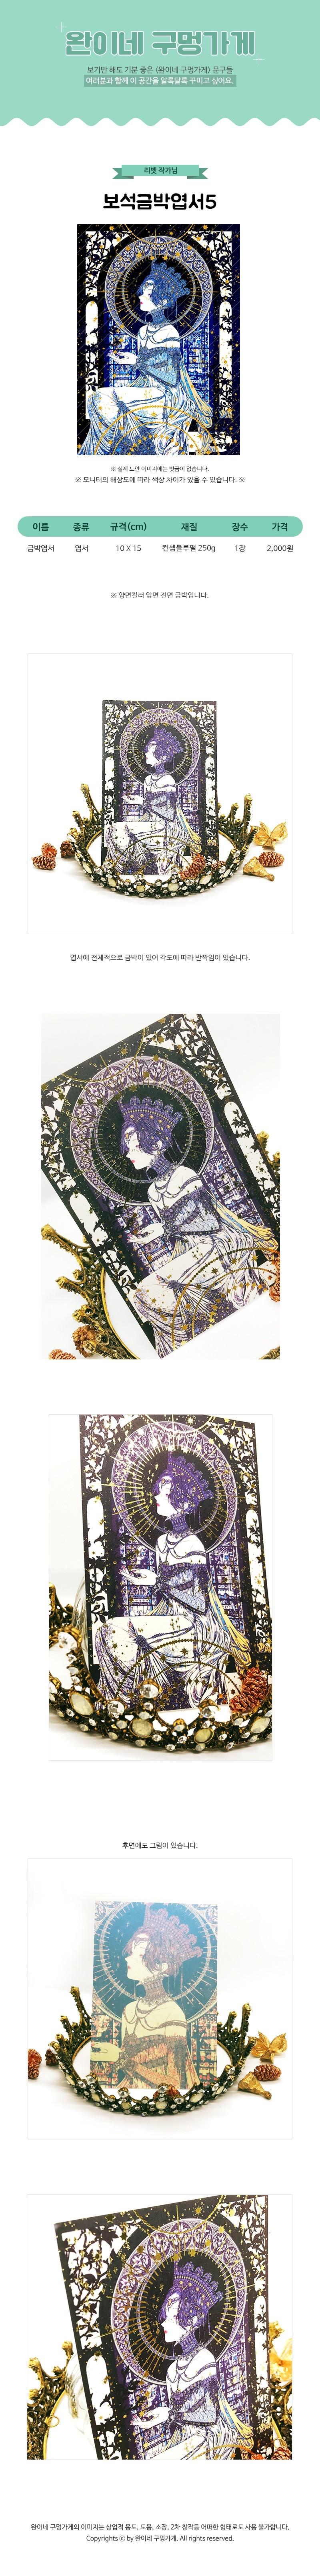 postcard44